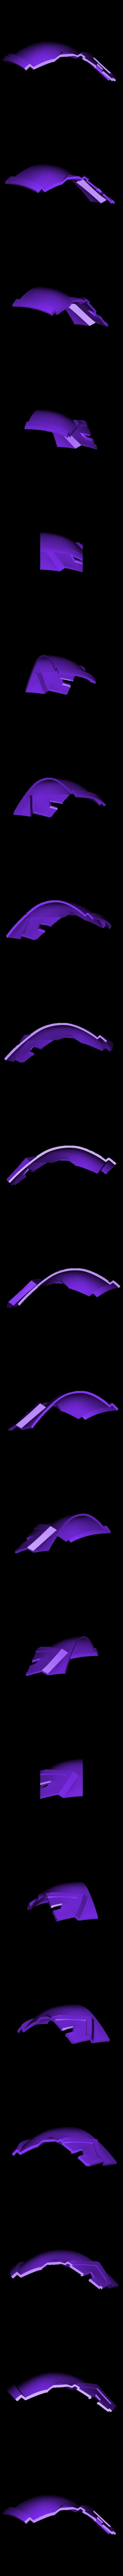 Part_14_v3.stl Download free STL file Blood Dragon Helmet Mass Effect 2 • Design to 3D print, VillainousPropShop